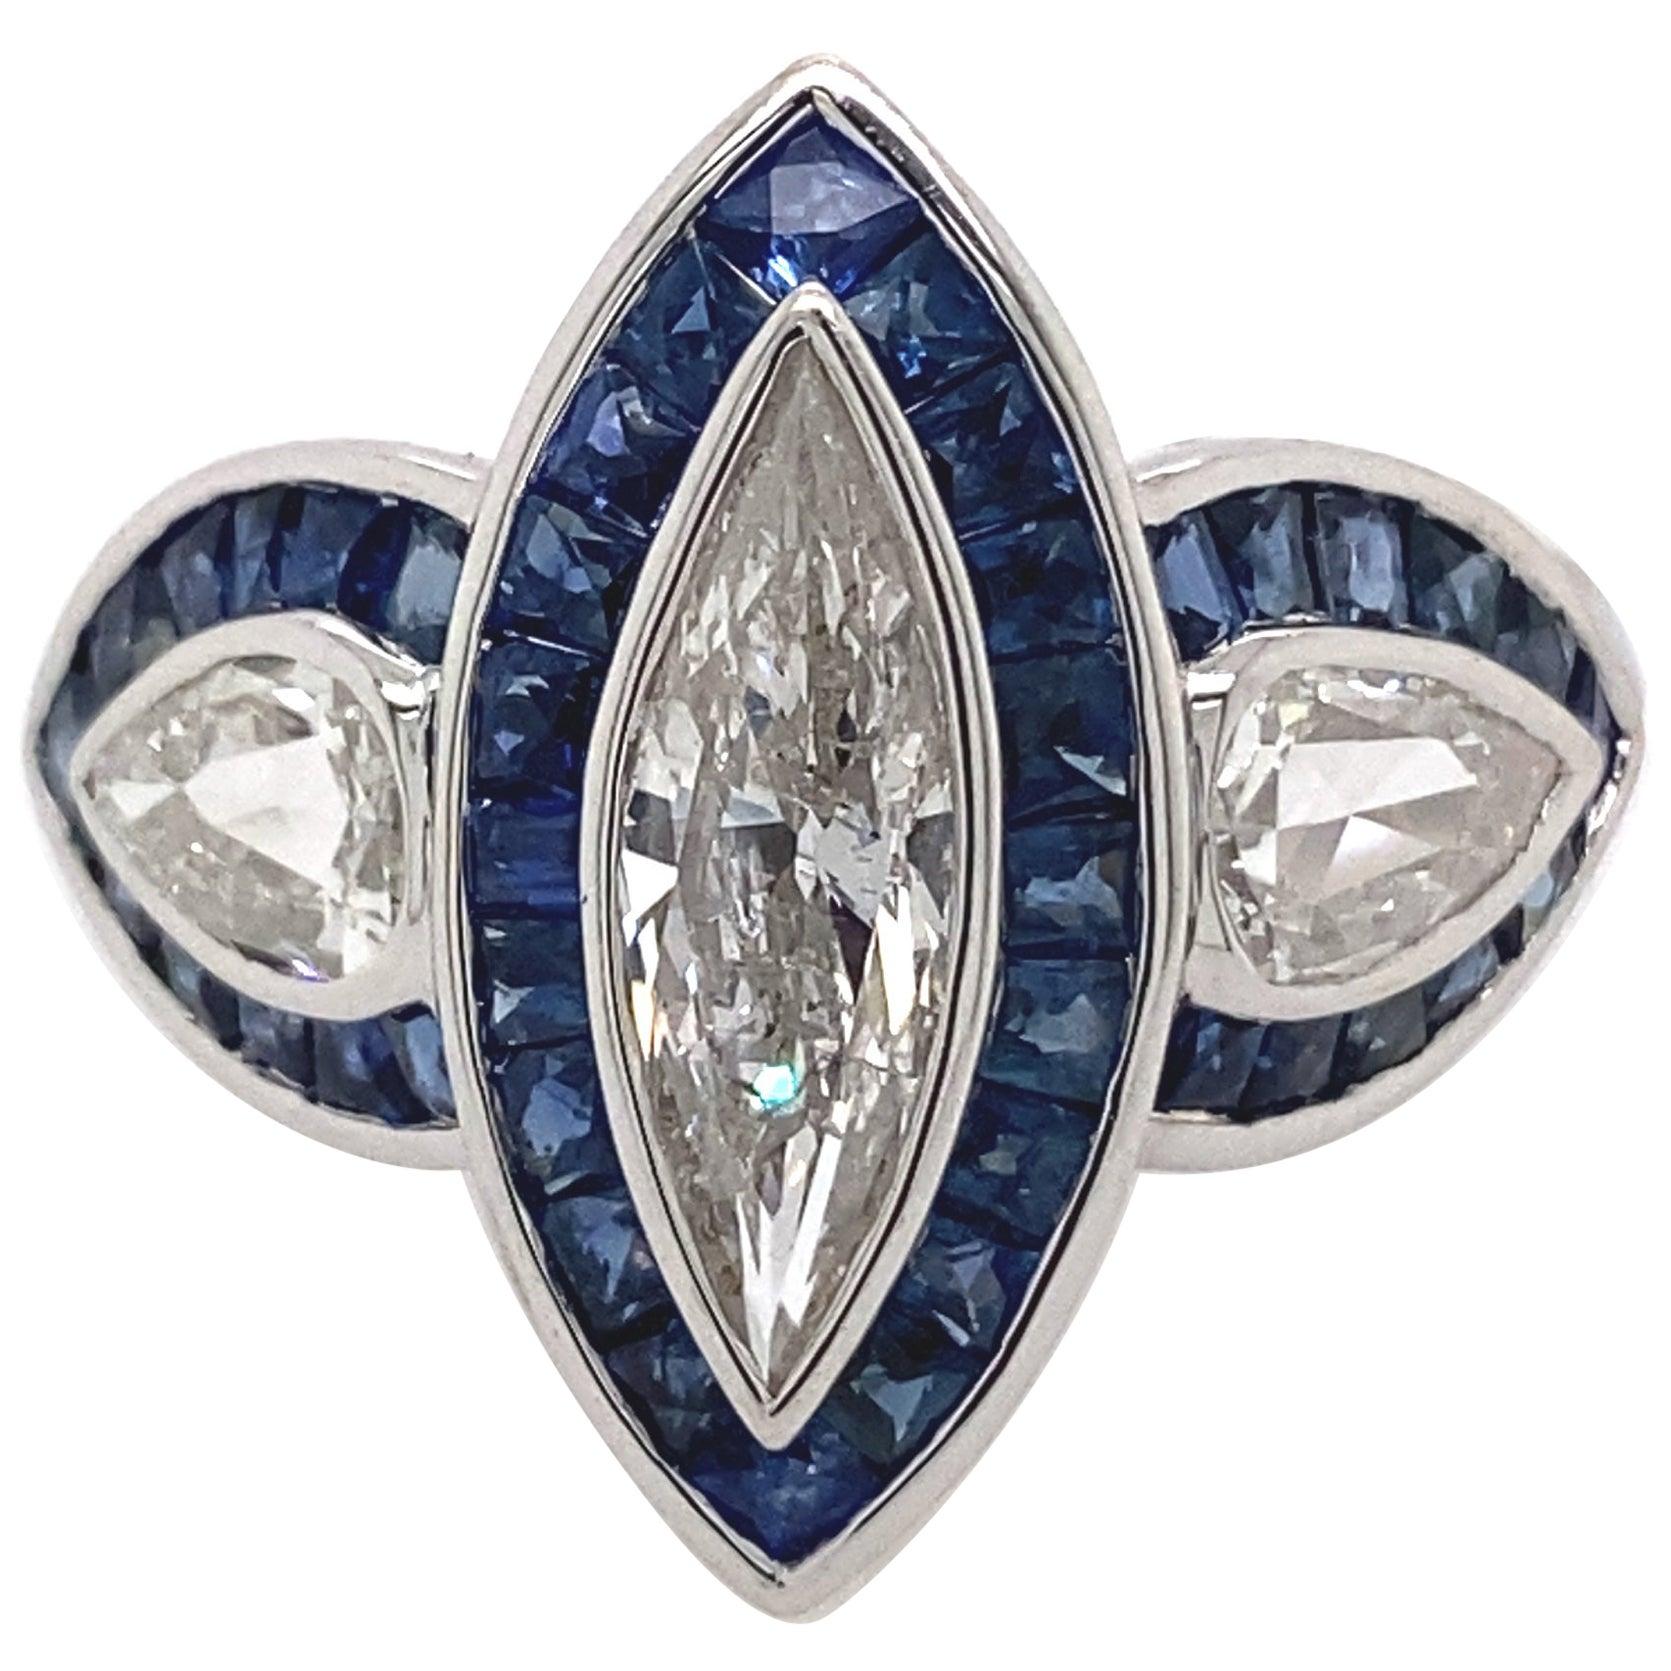 Art Deco Inspired Diamond and Sapphire Ring 18 Karat White Gold